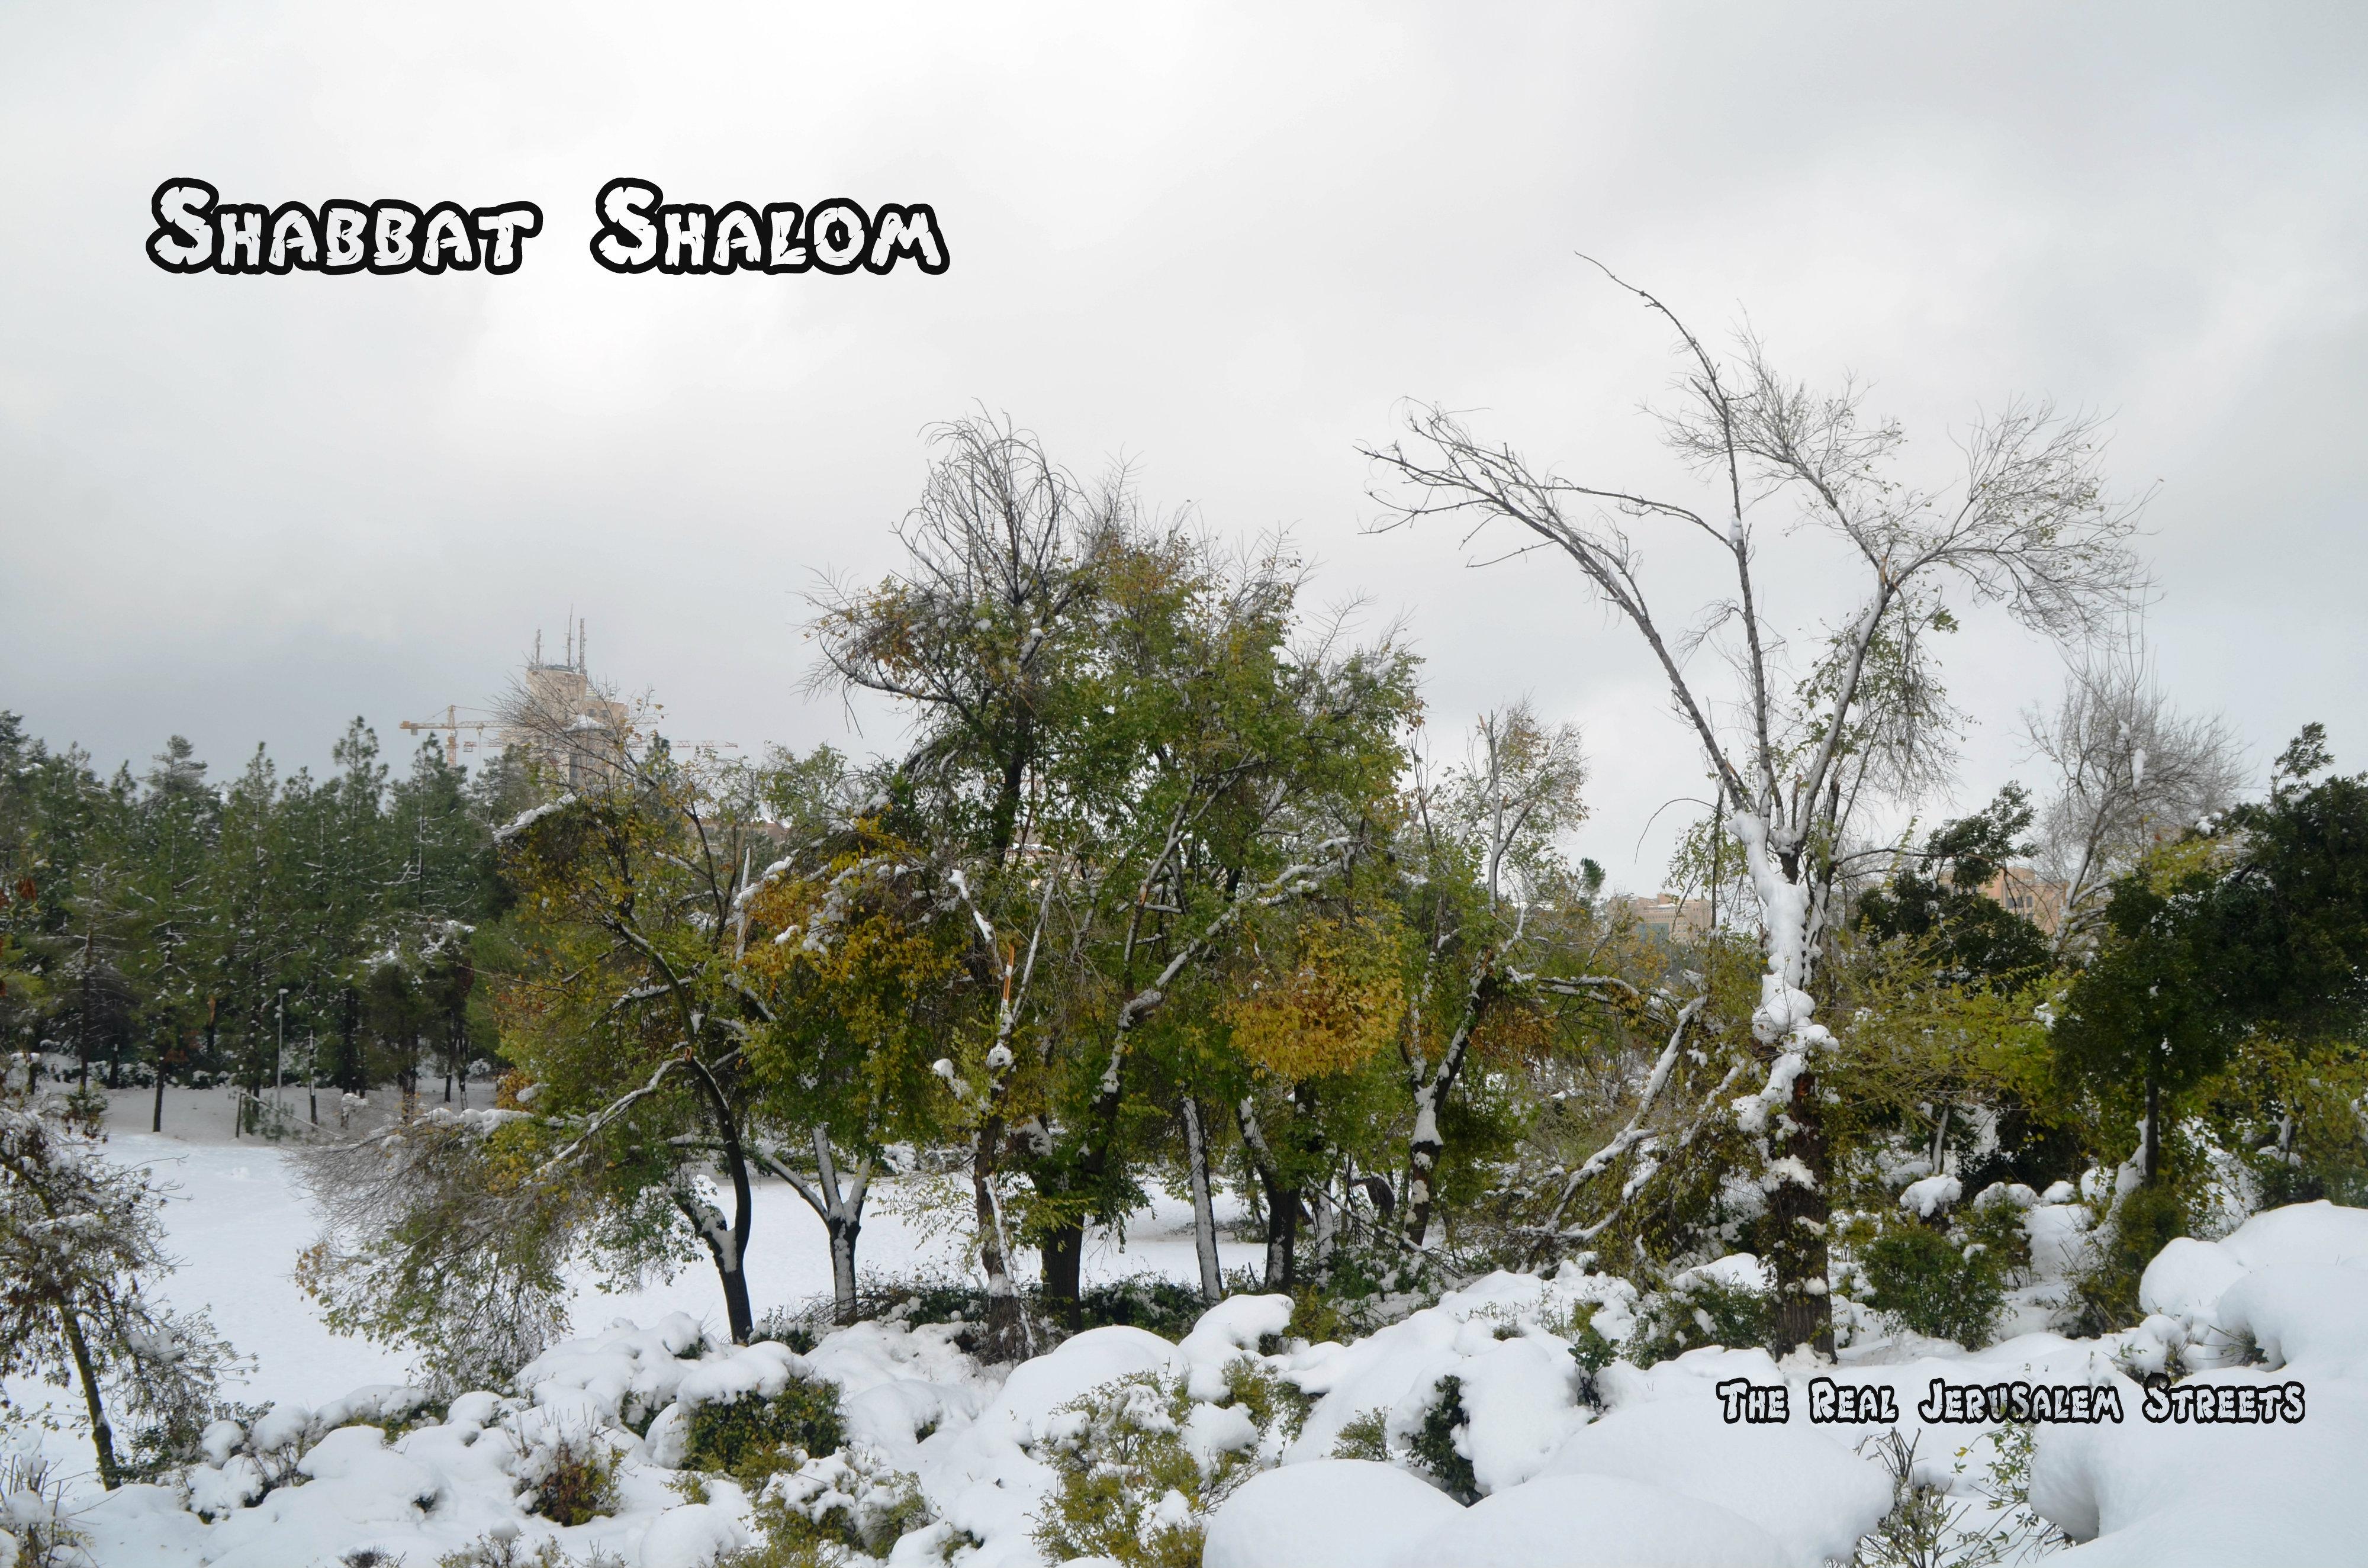 Shabbat shalom image, picture Shabat shalom winter, photo Jerusalem park in snow Shabbat